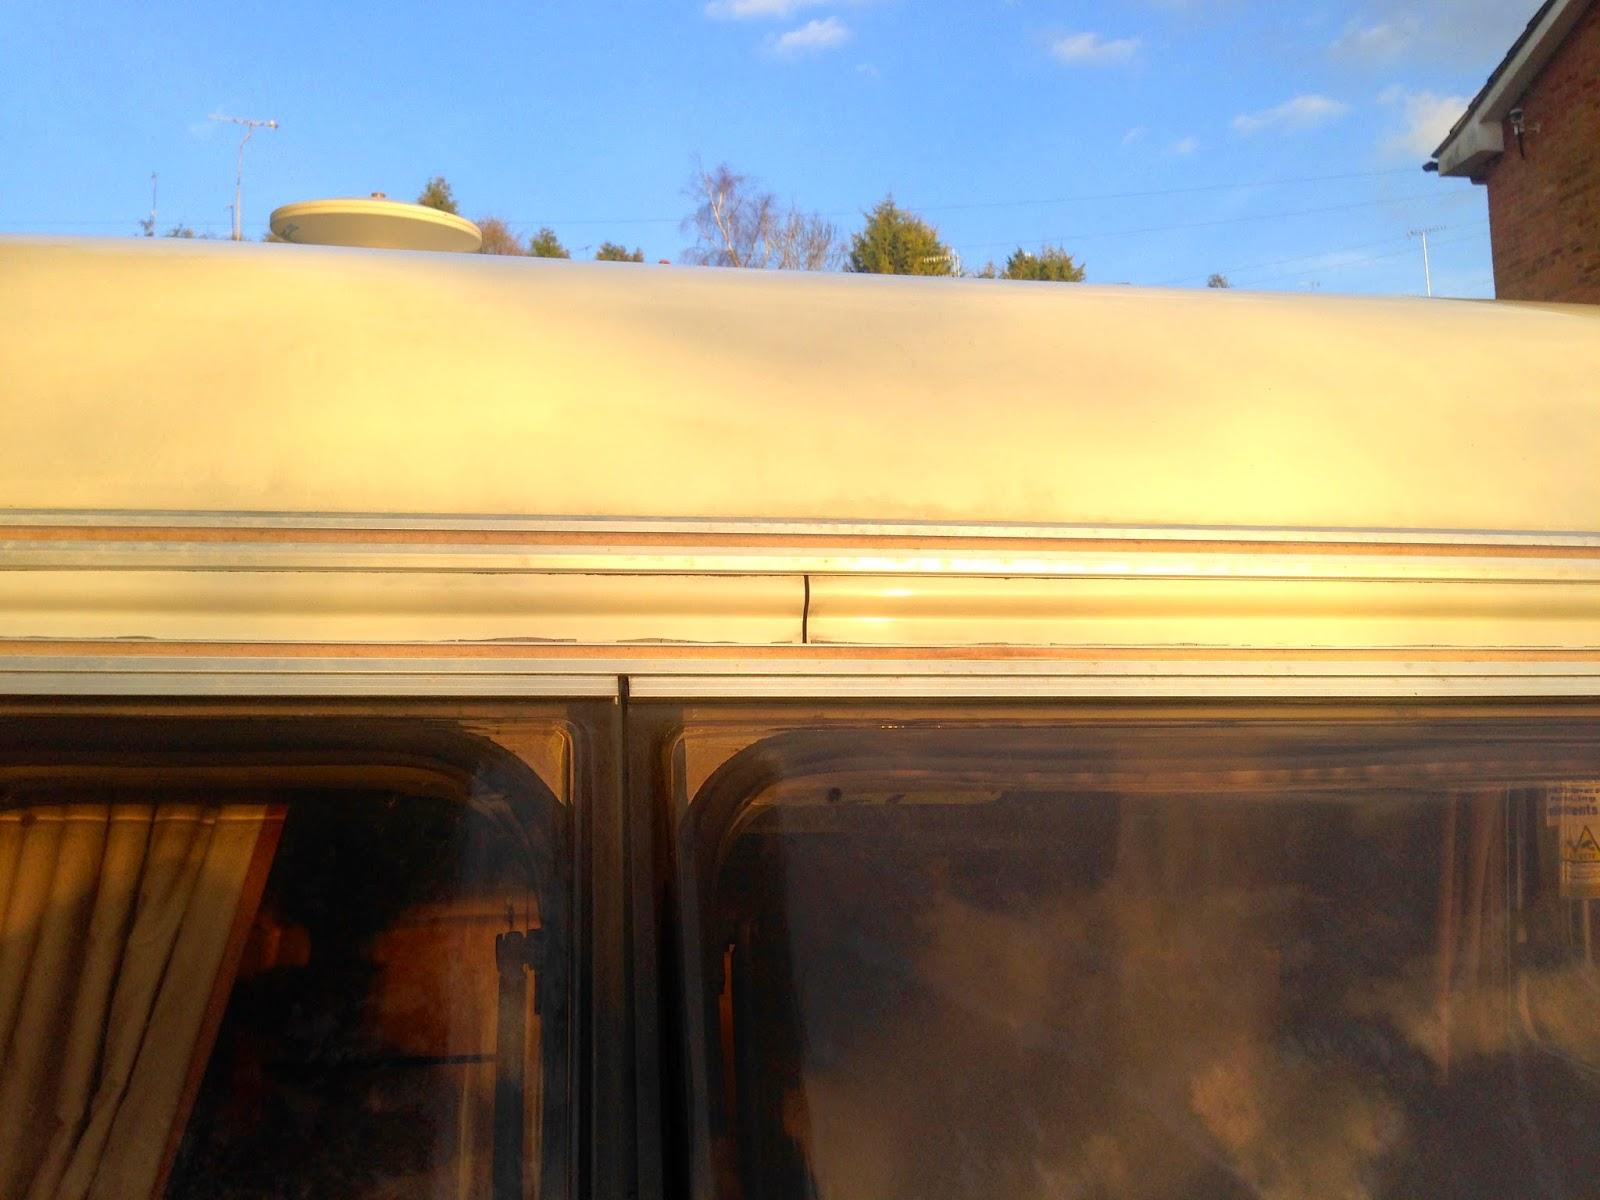 Caravan Damp Repair - Elddis Elusion 350/2 from 1994: My Blog of